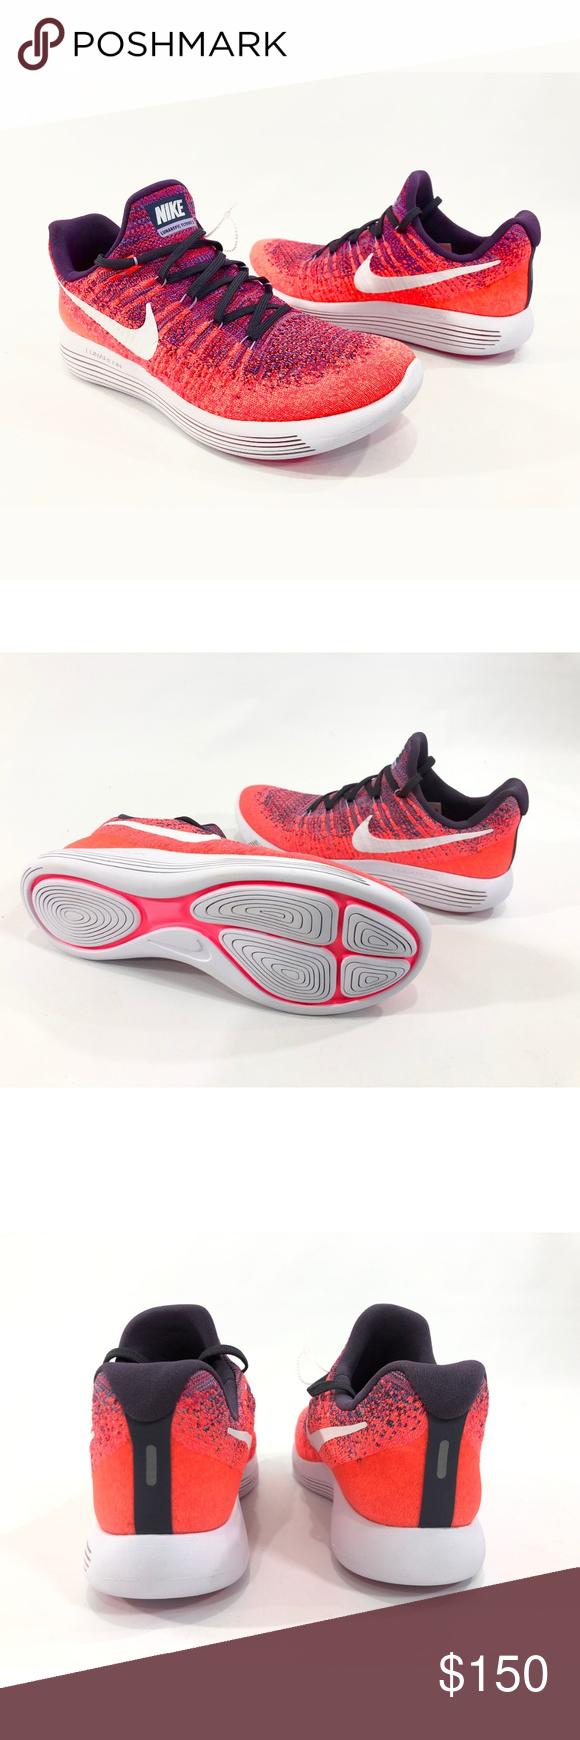 premium selection 72e6d c925b Nike Lunarepic Low Flyknit 2 Women's Running Shoes NIKE ...